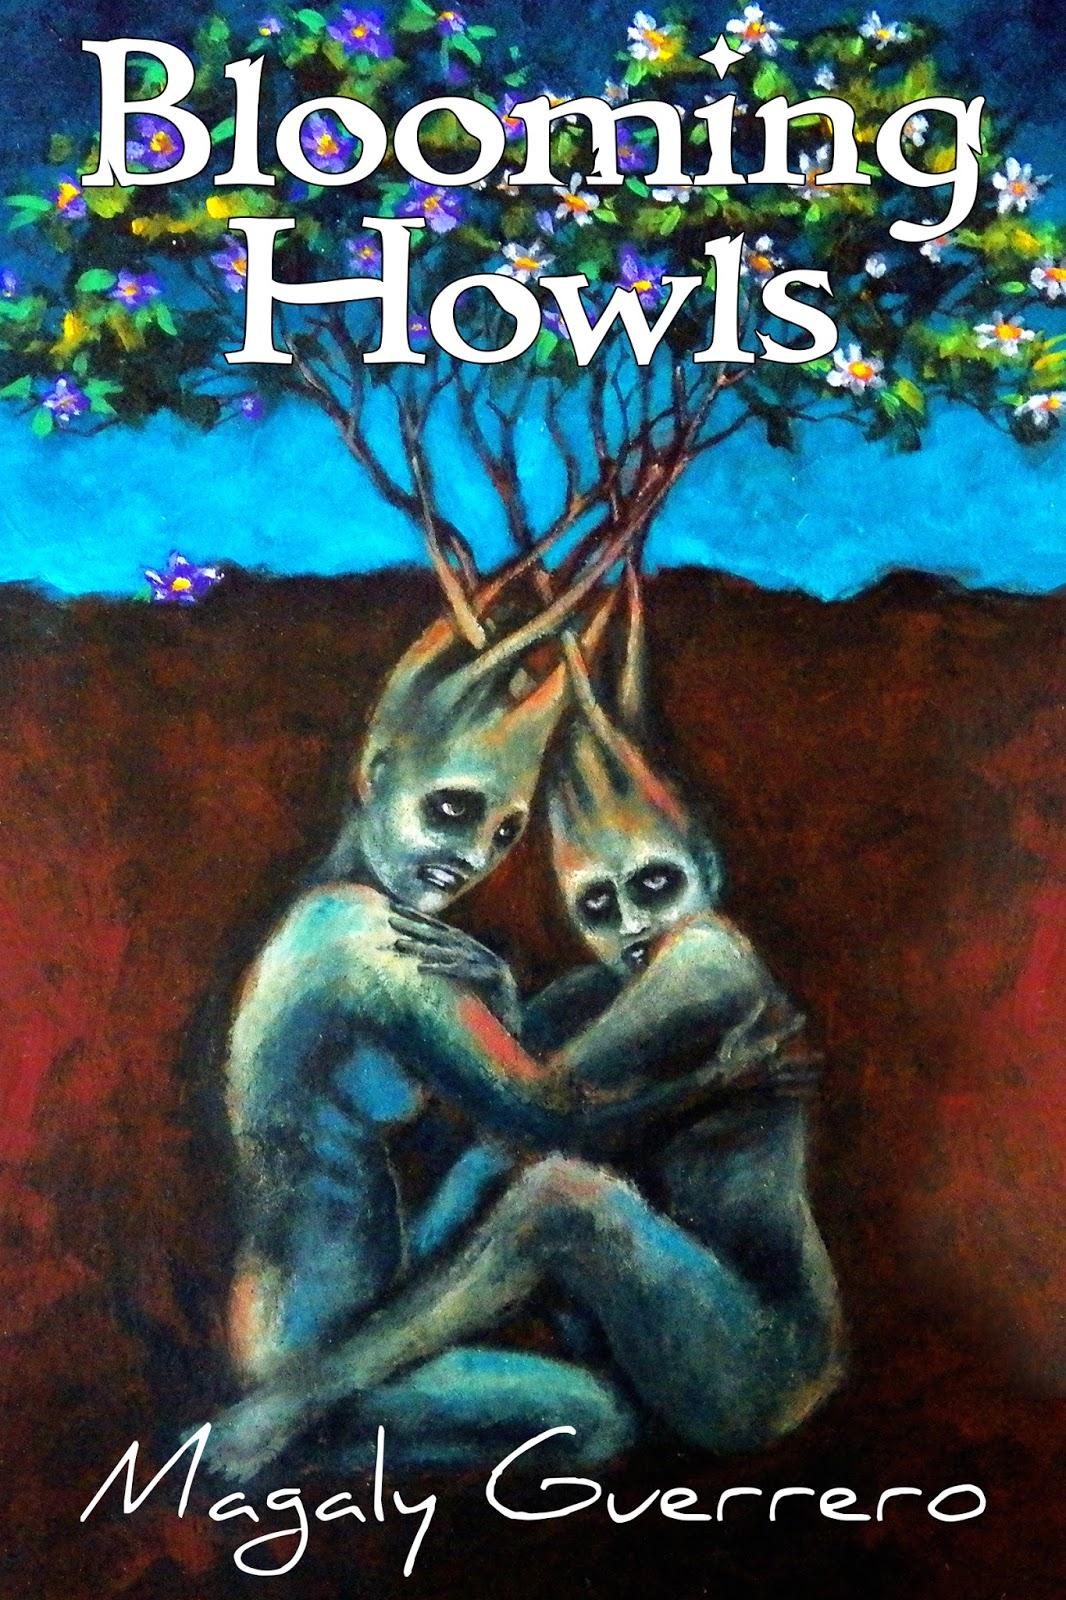 http://pagan-culture.blogspot.com/p/blooming-howls.html